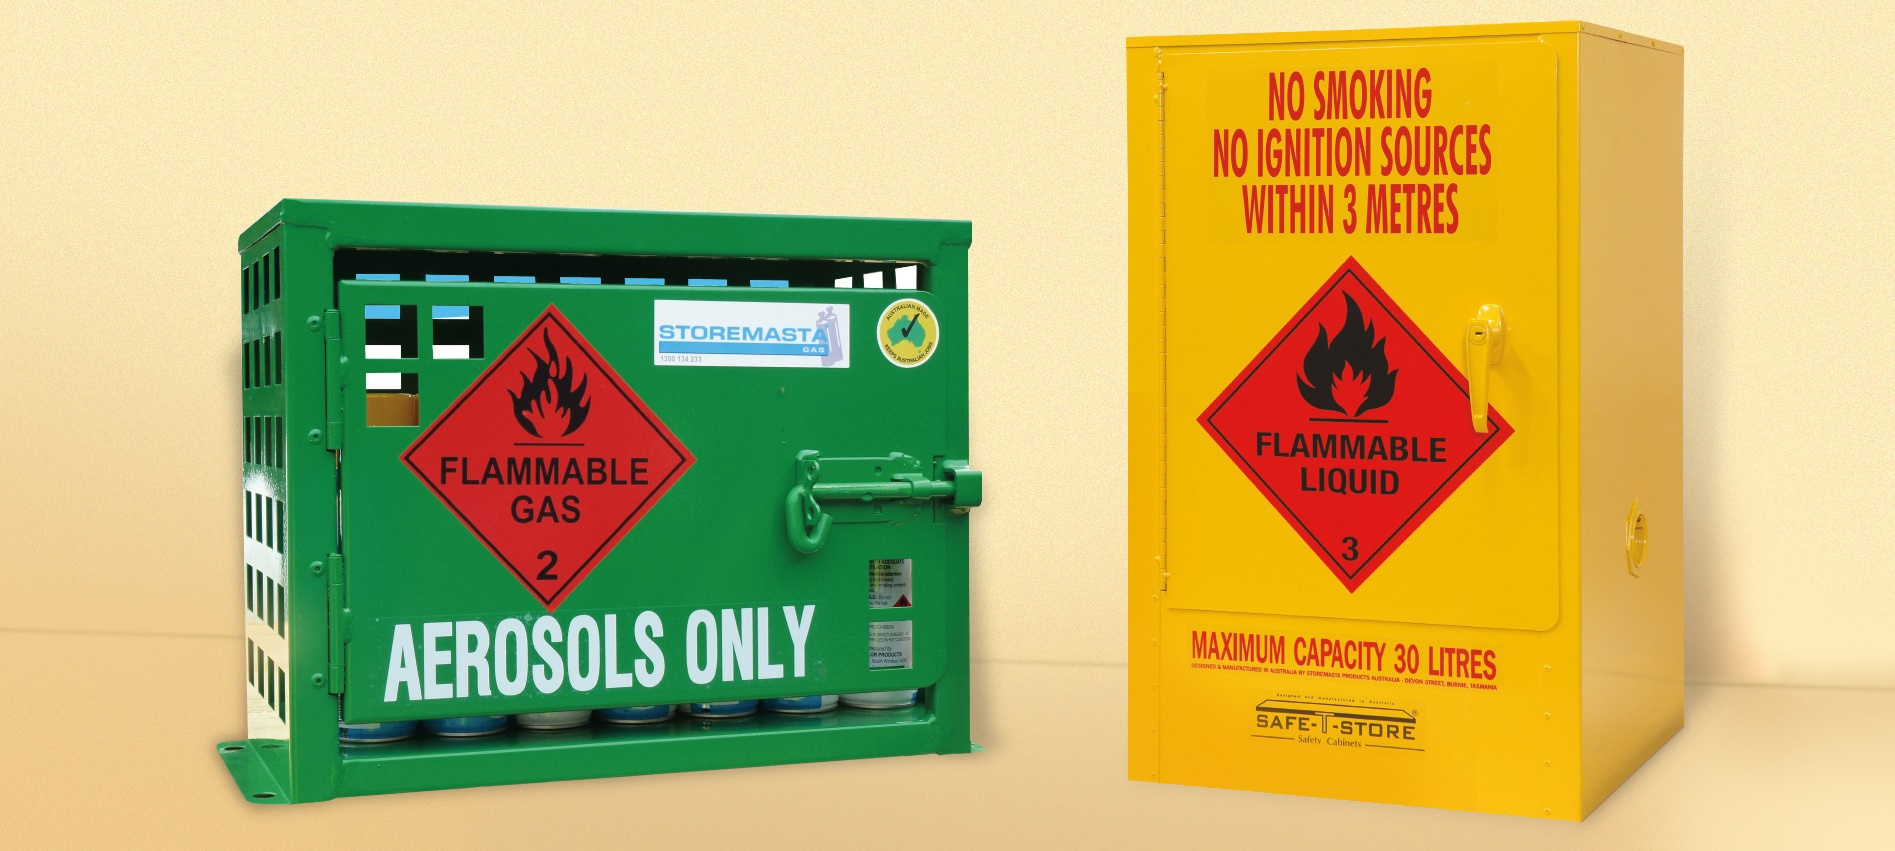 Storing Aerosols Correctly: aerosol cages vs flammable liquids cabinets